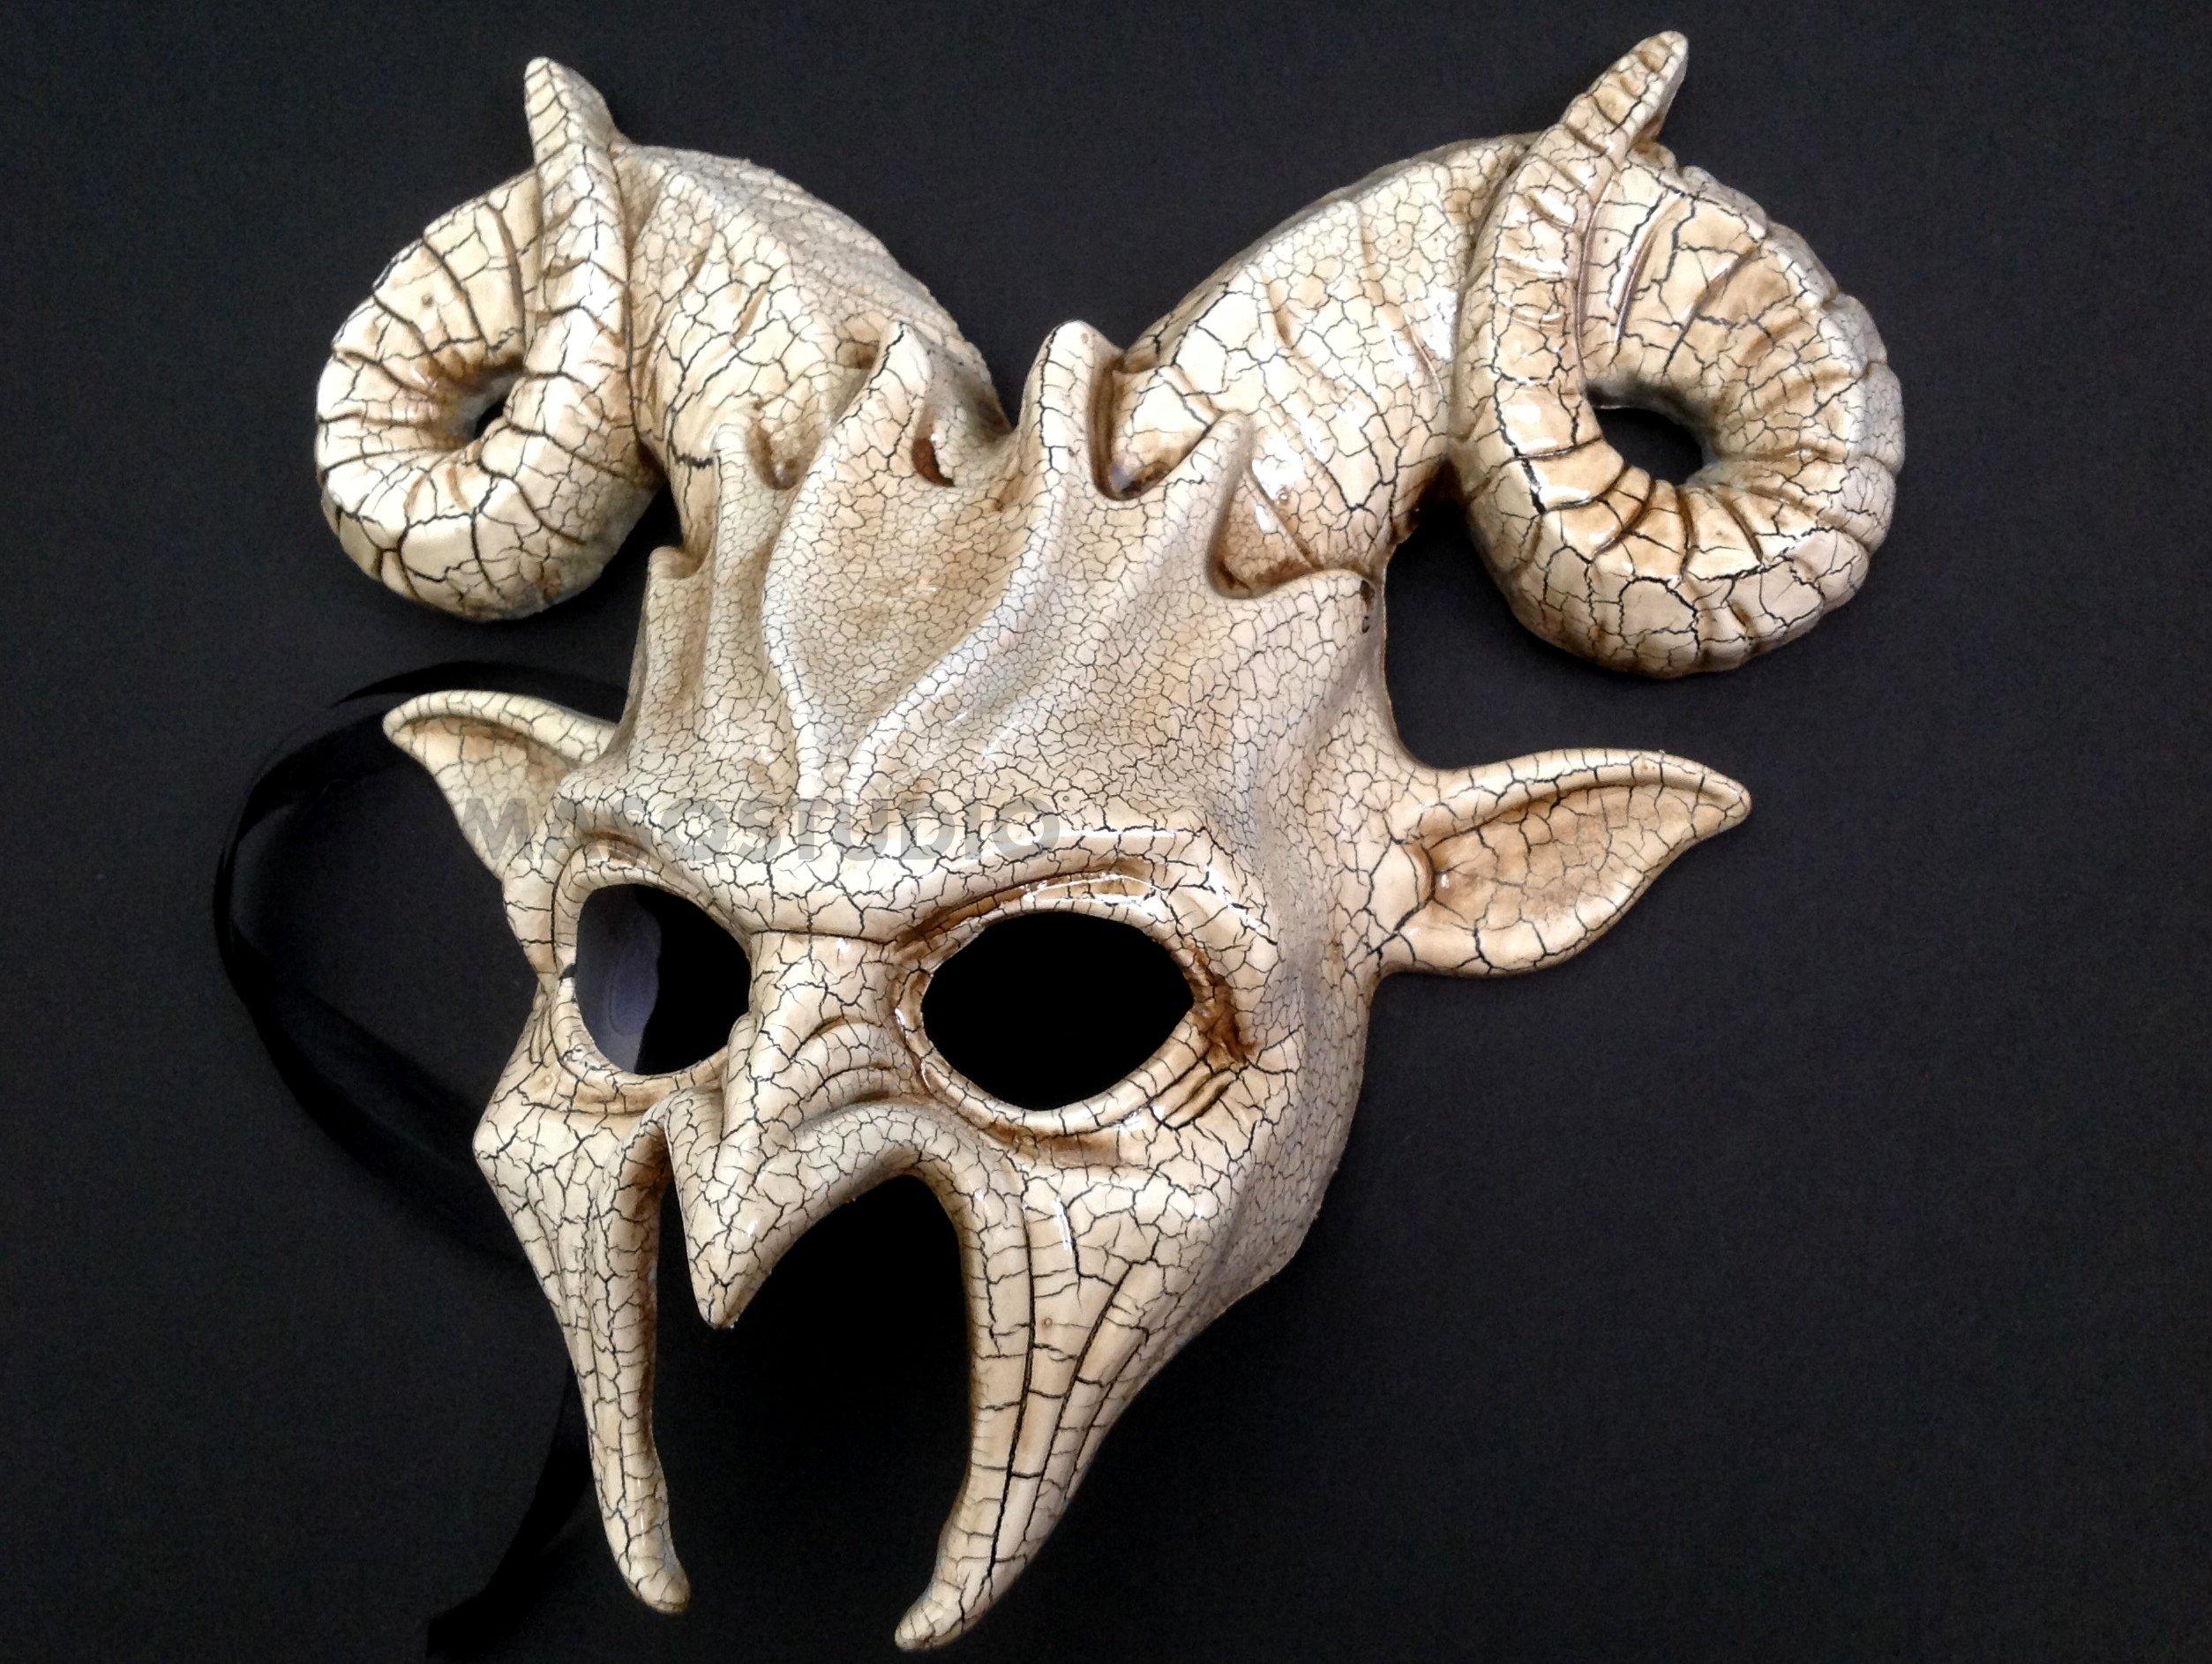 Crack Ram Goat Mask Animal Ram Masquerade Halloween Cosplay Big Horns mask